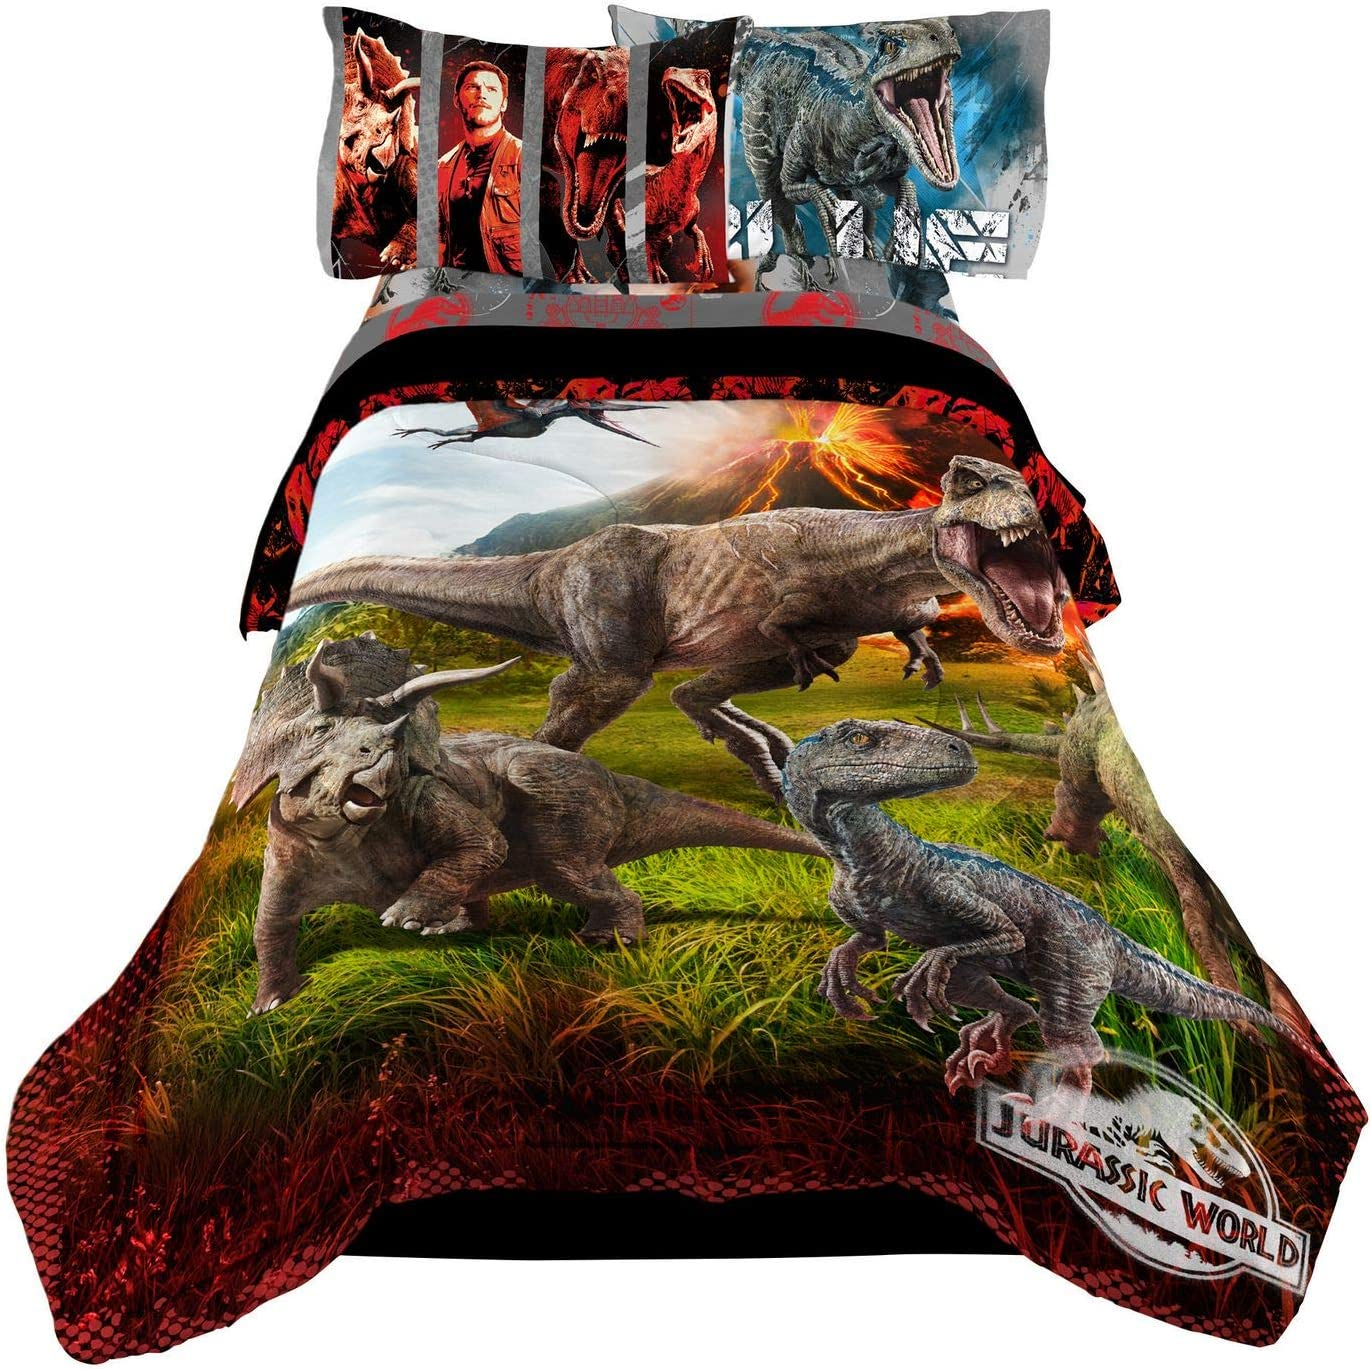 "Jurassic World Kids Bedding Sheet Full Sheet Set with Full Comforter 5 Piece -72"" x 85"""